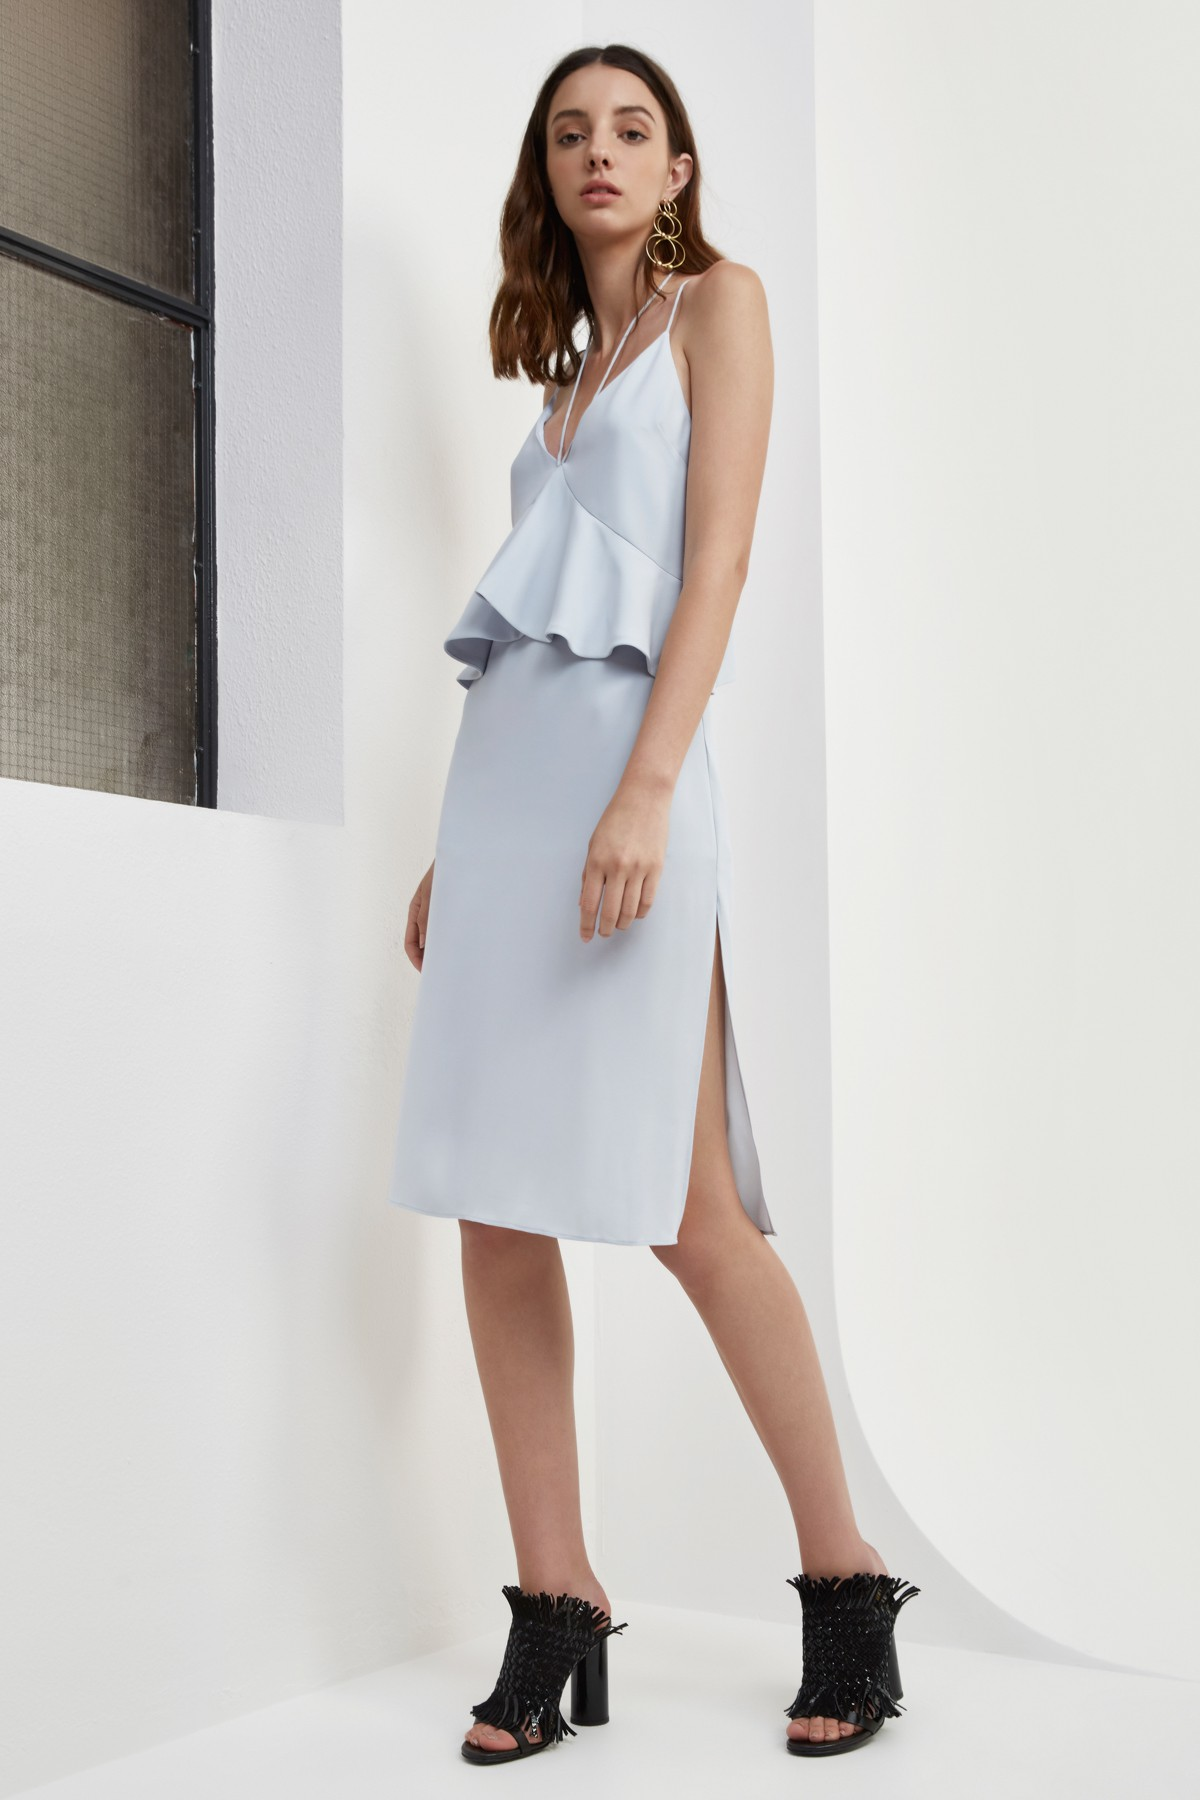 Shop C/MEO Lose Control Midi Dress.